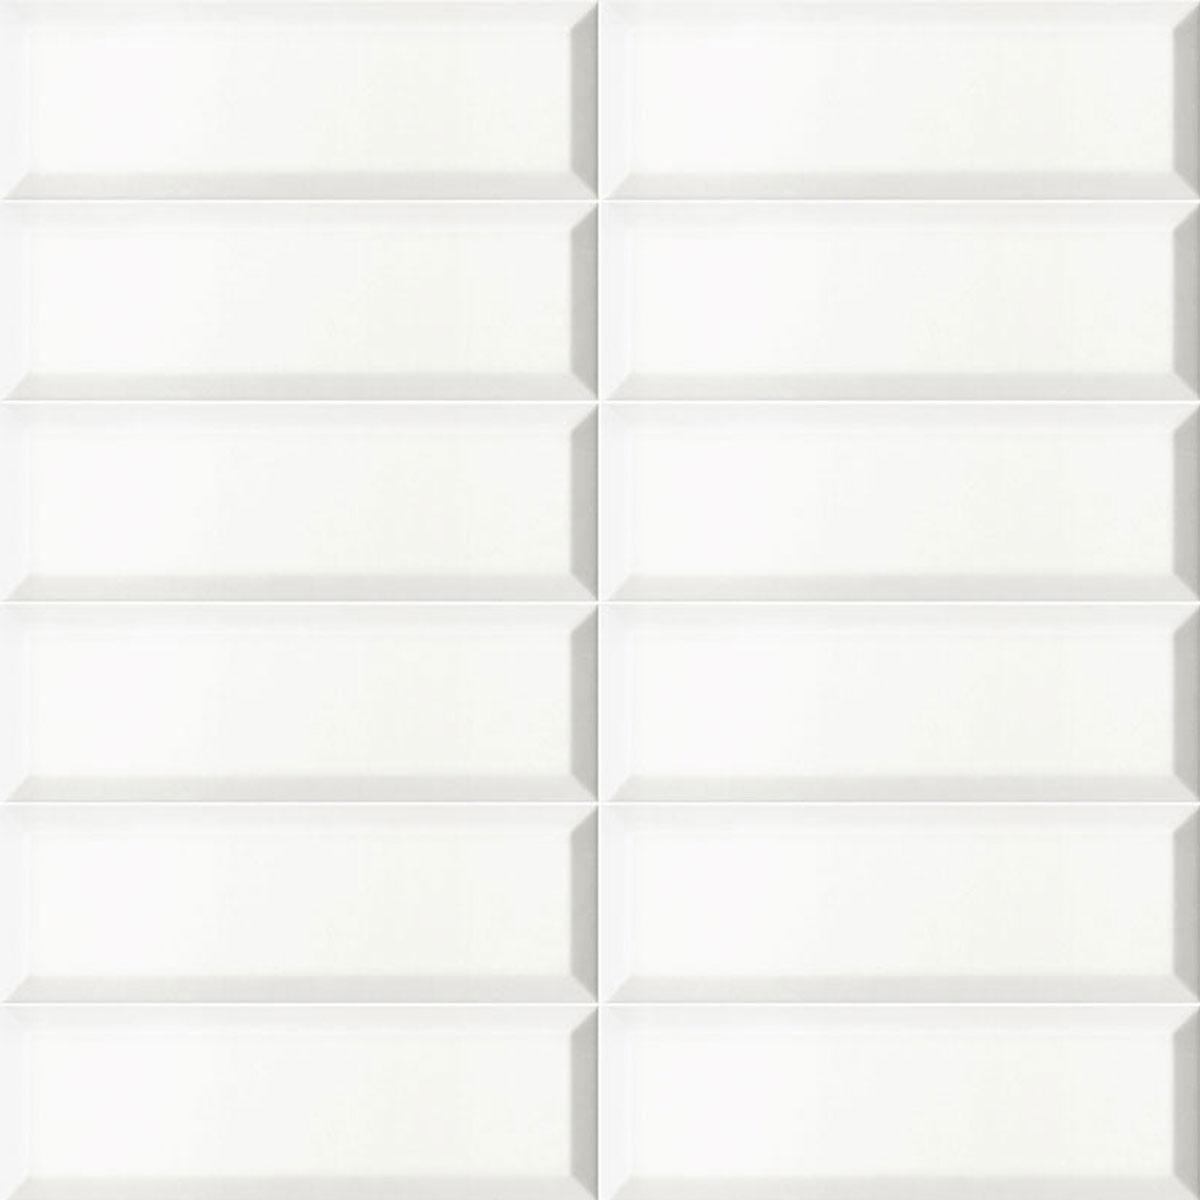 Bissel Blanco Mate 10x30